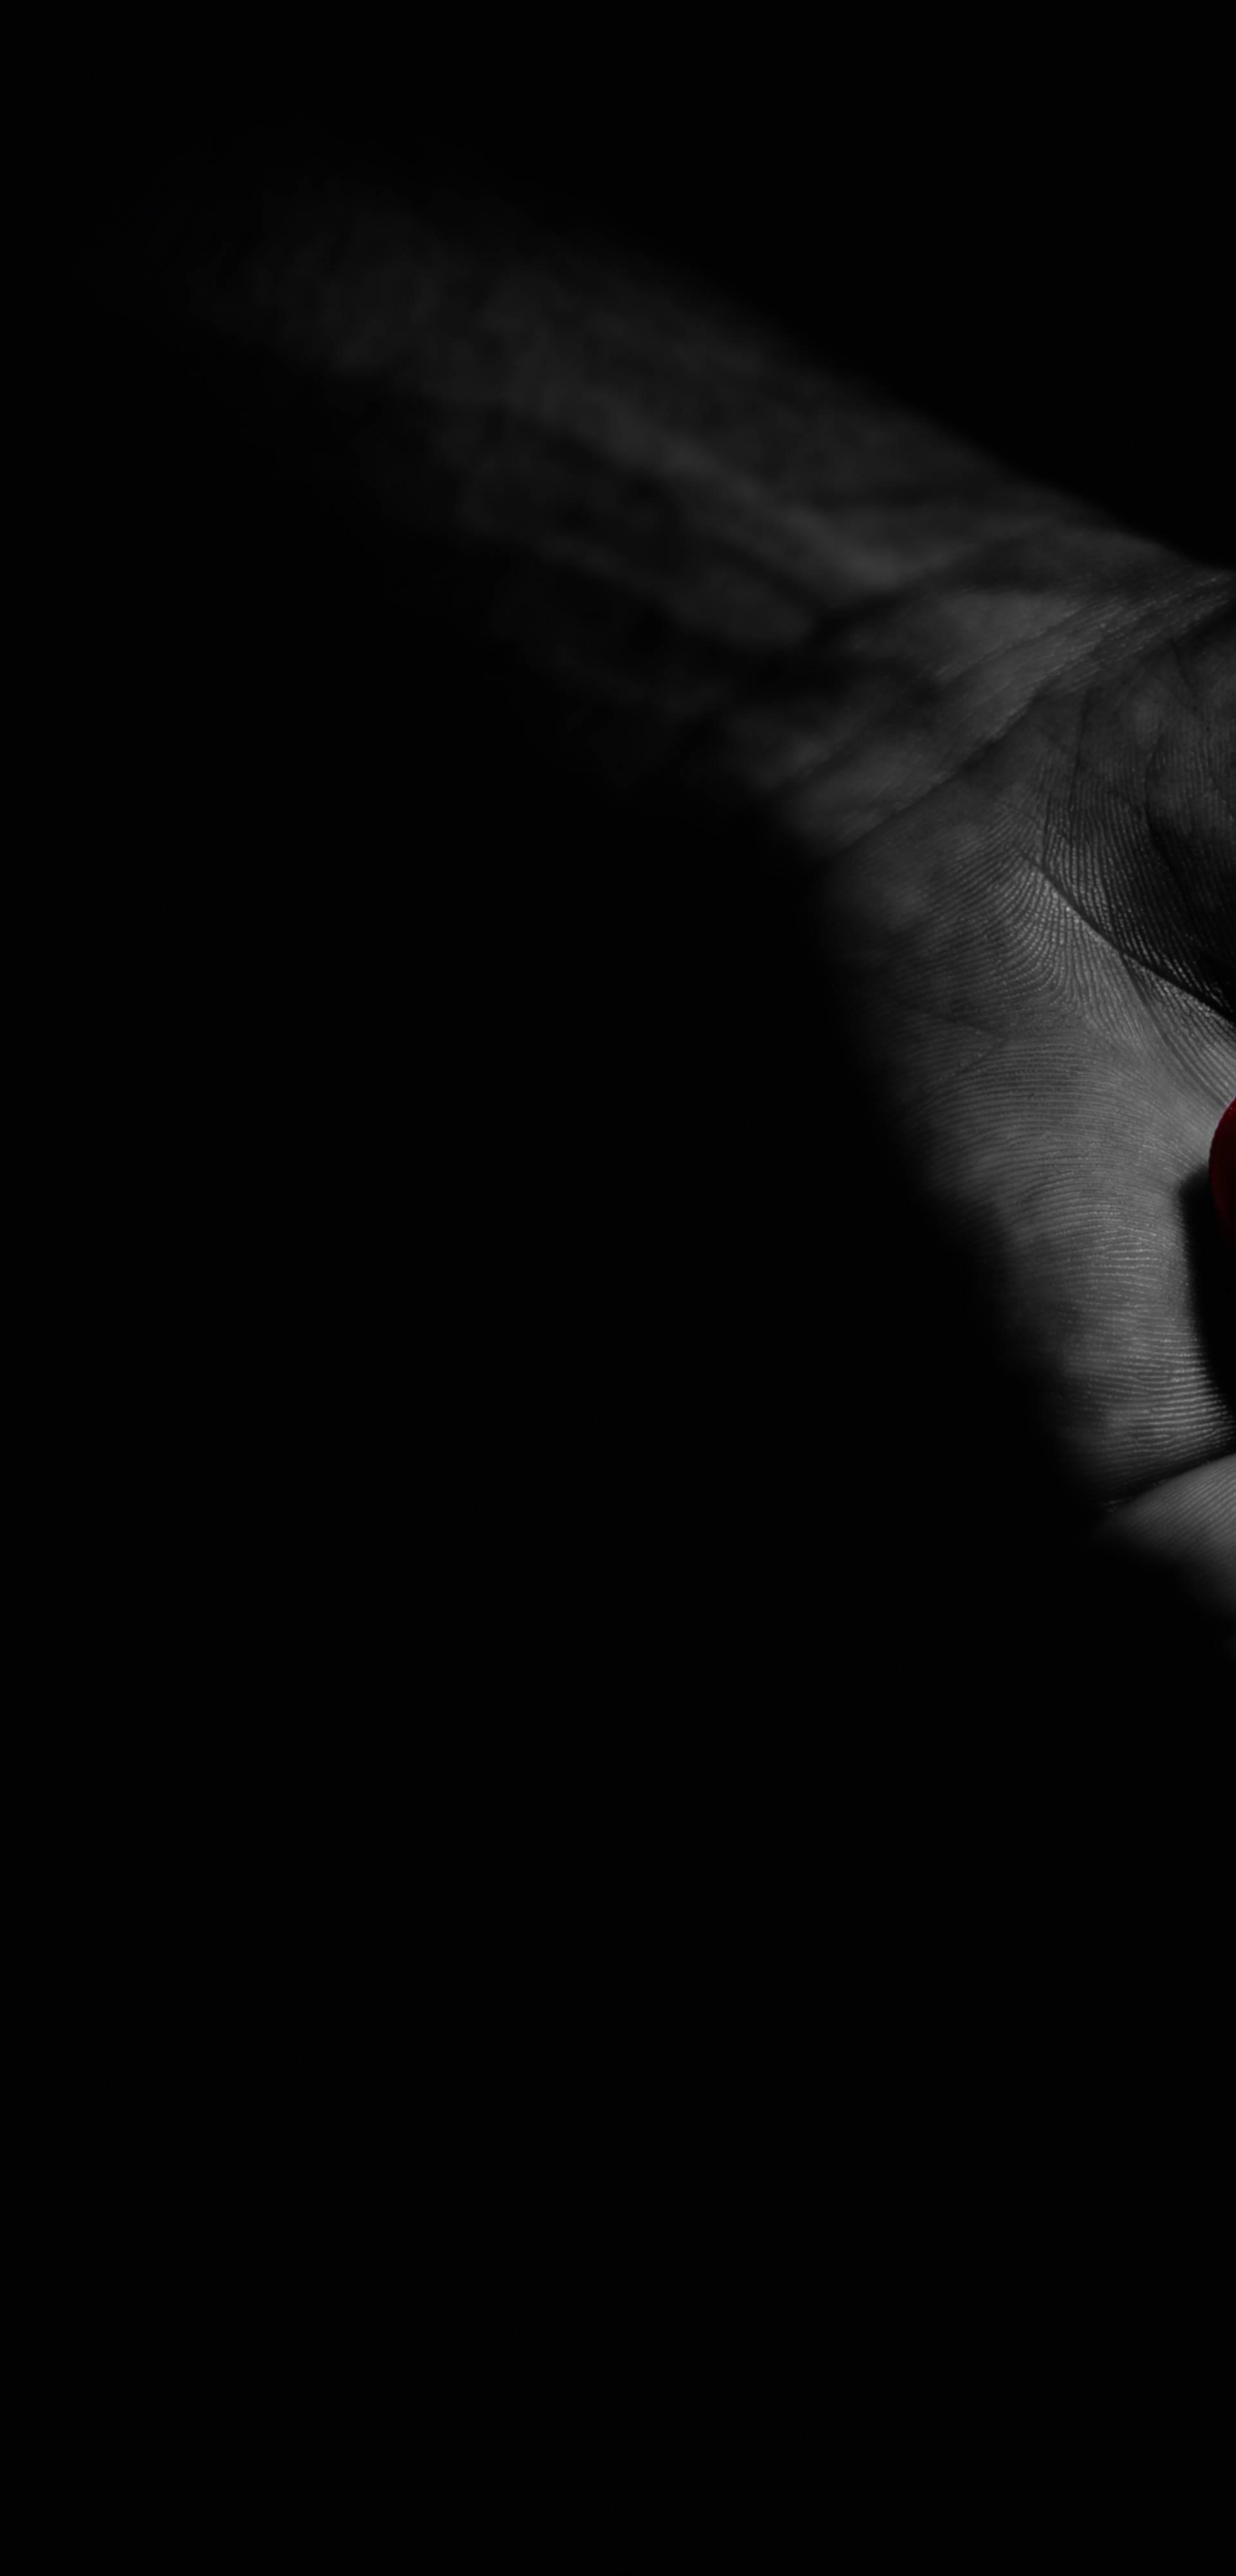 Iskorak ponovno testira na HIV i sifilis: 'Nakon karantene je narastao interes'